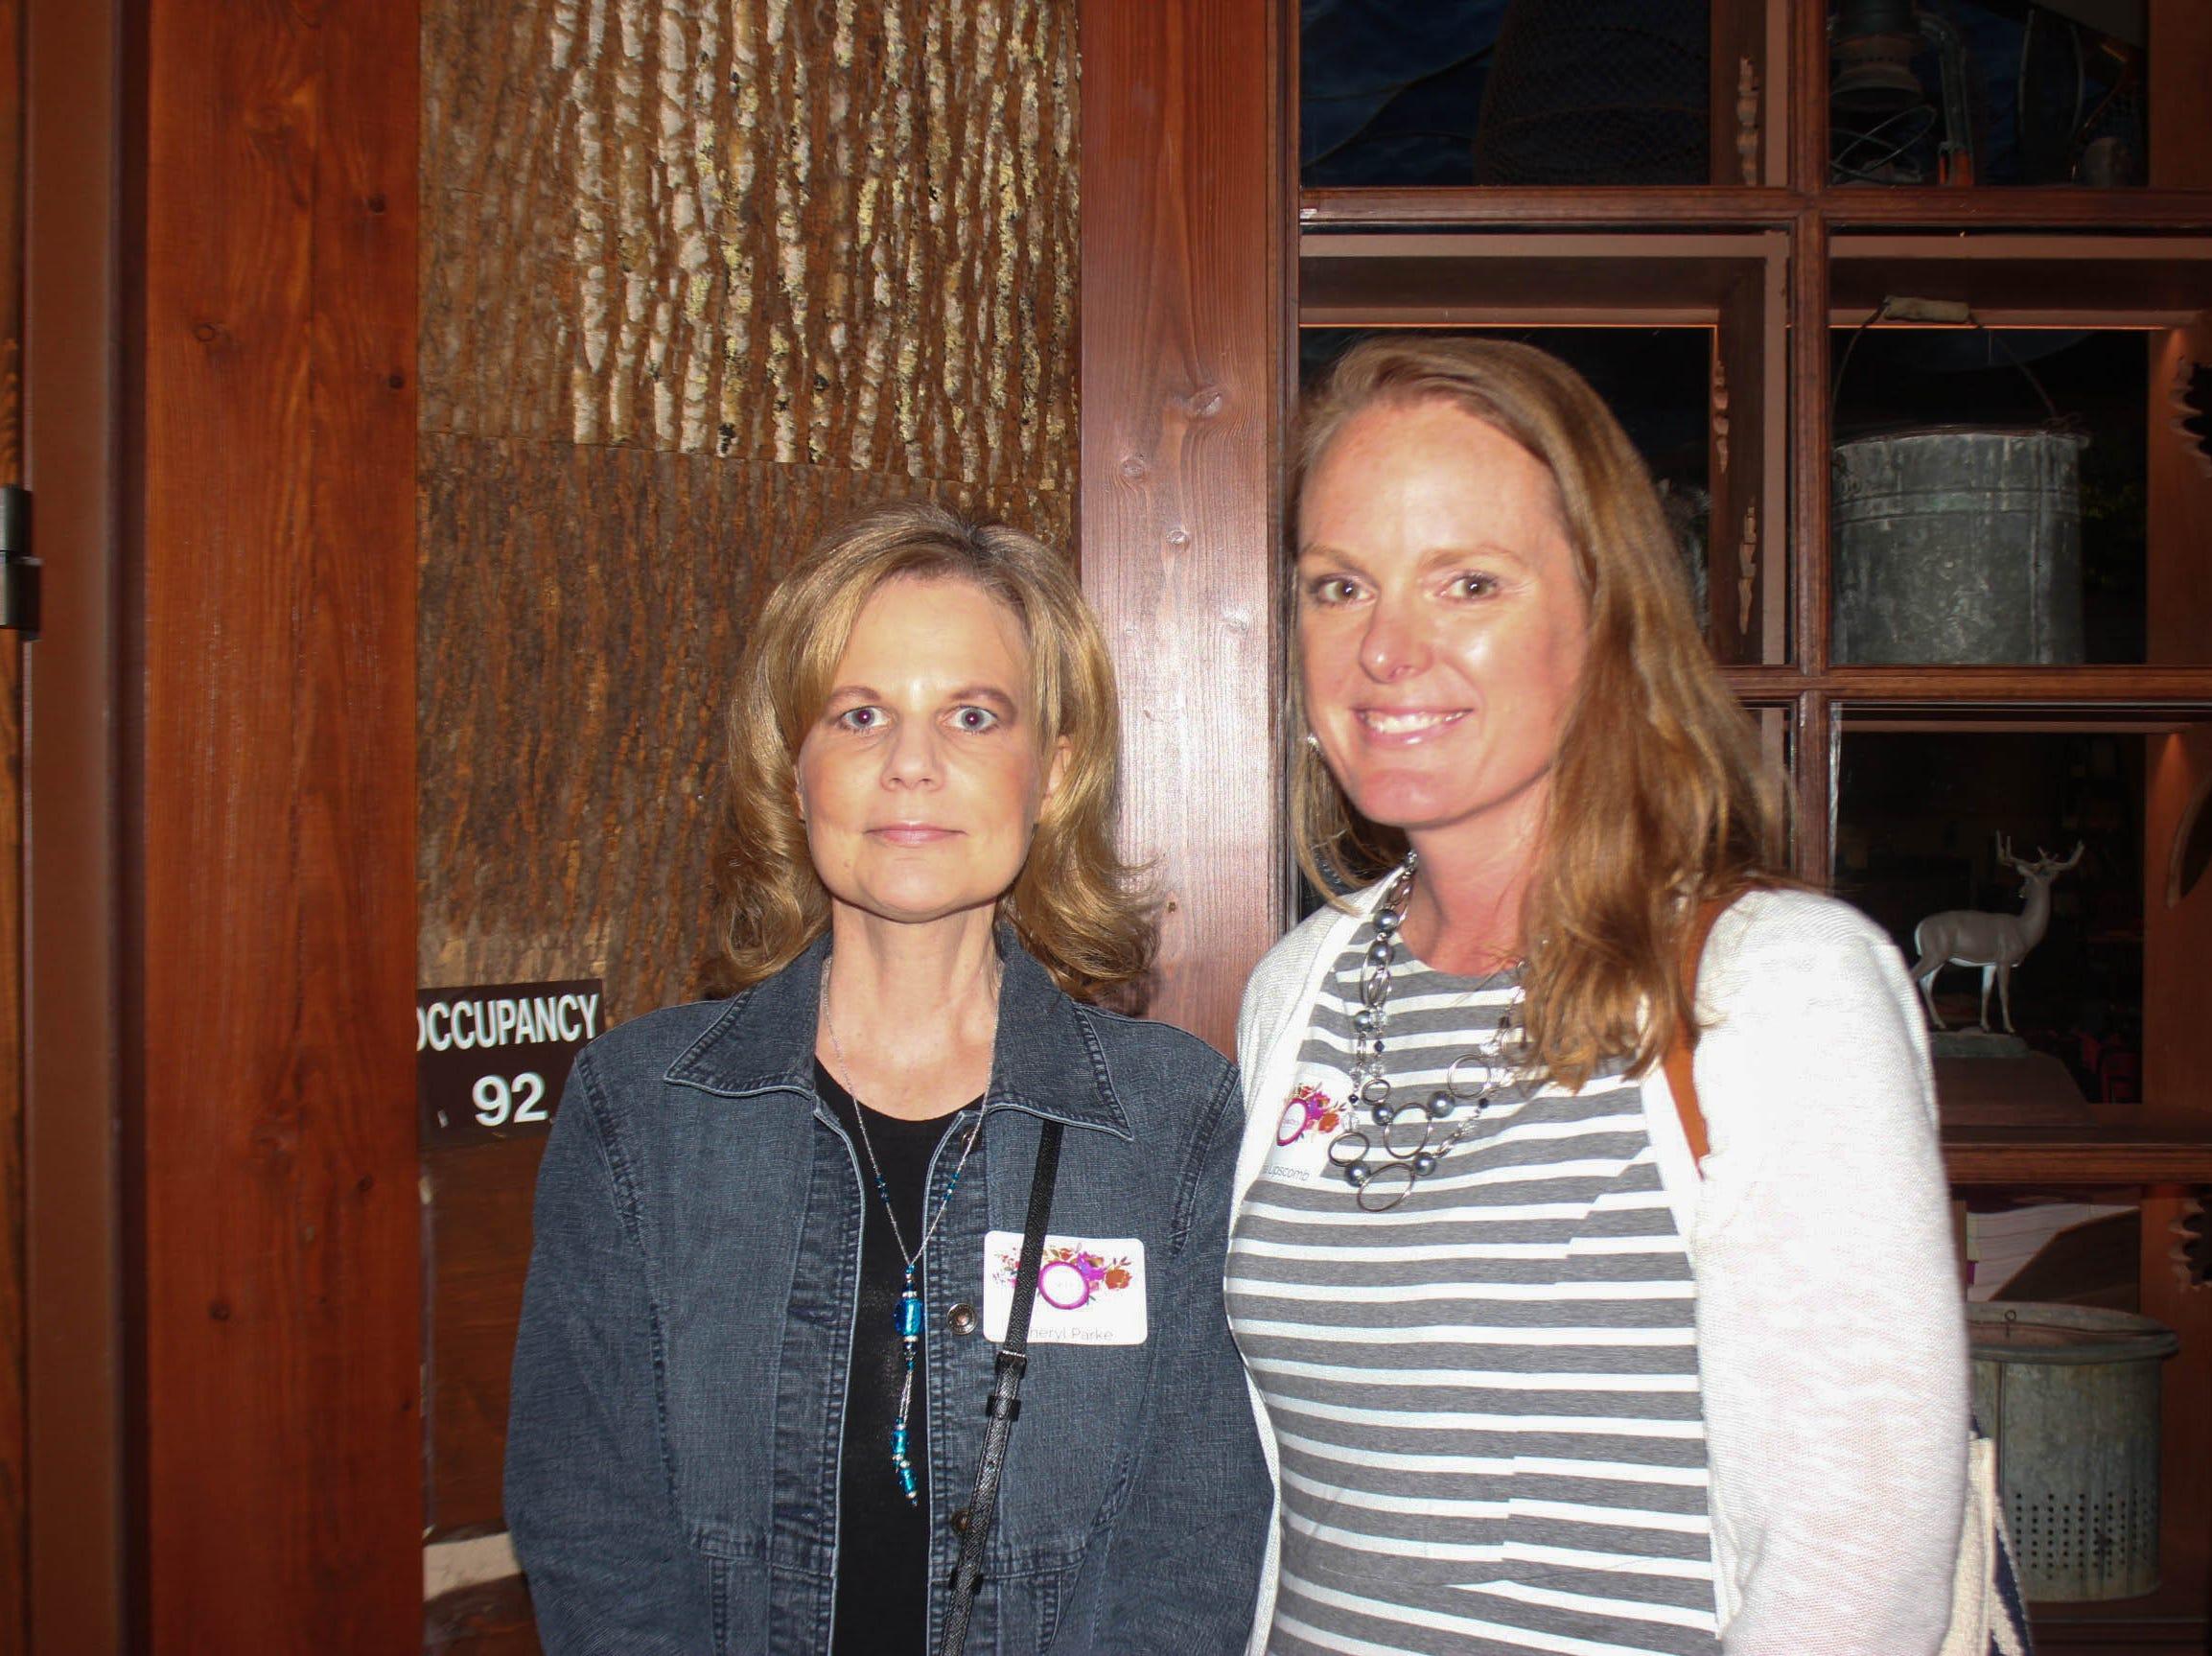 Cheryl Parke and Cynthia Lipscomb